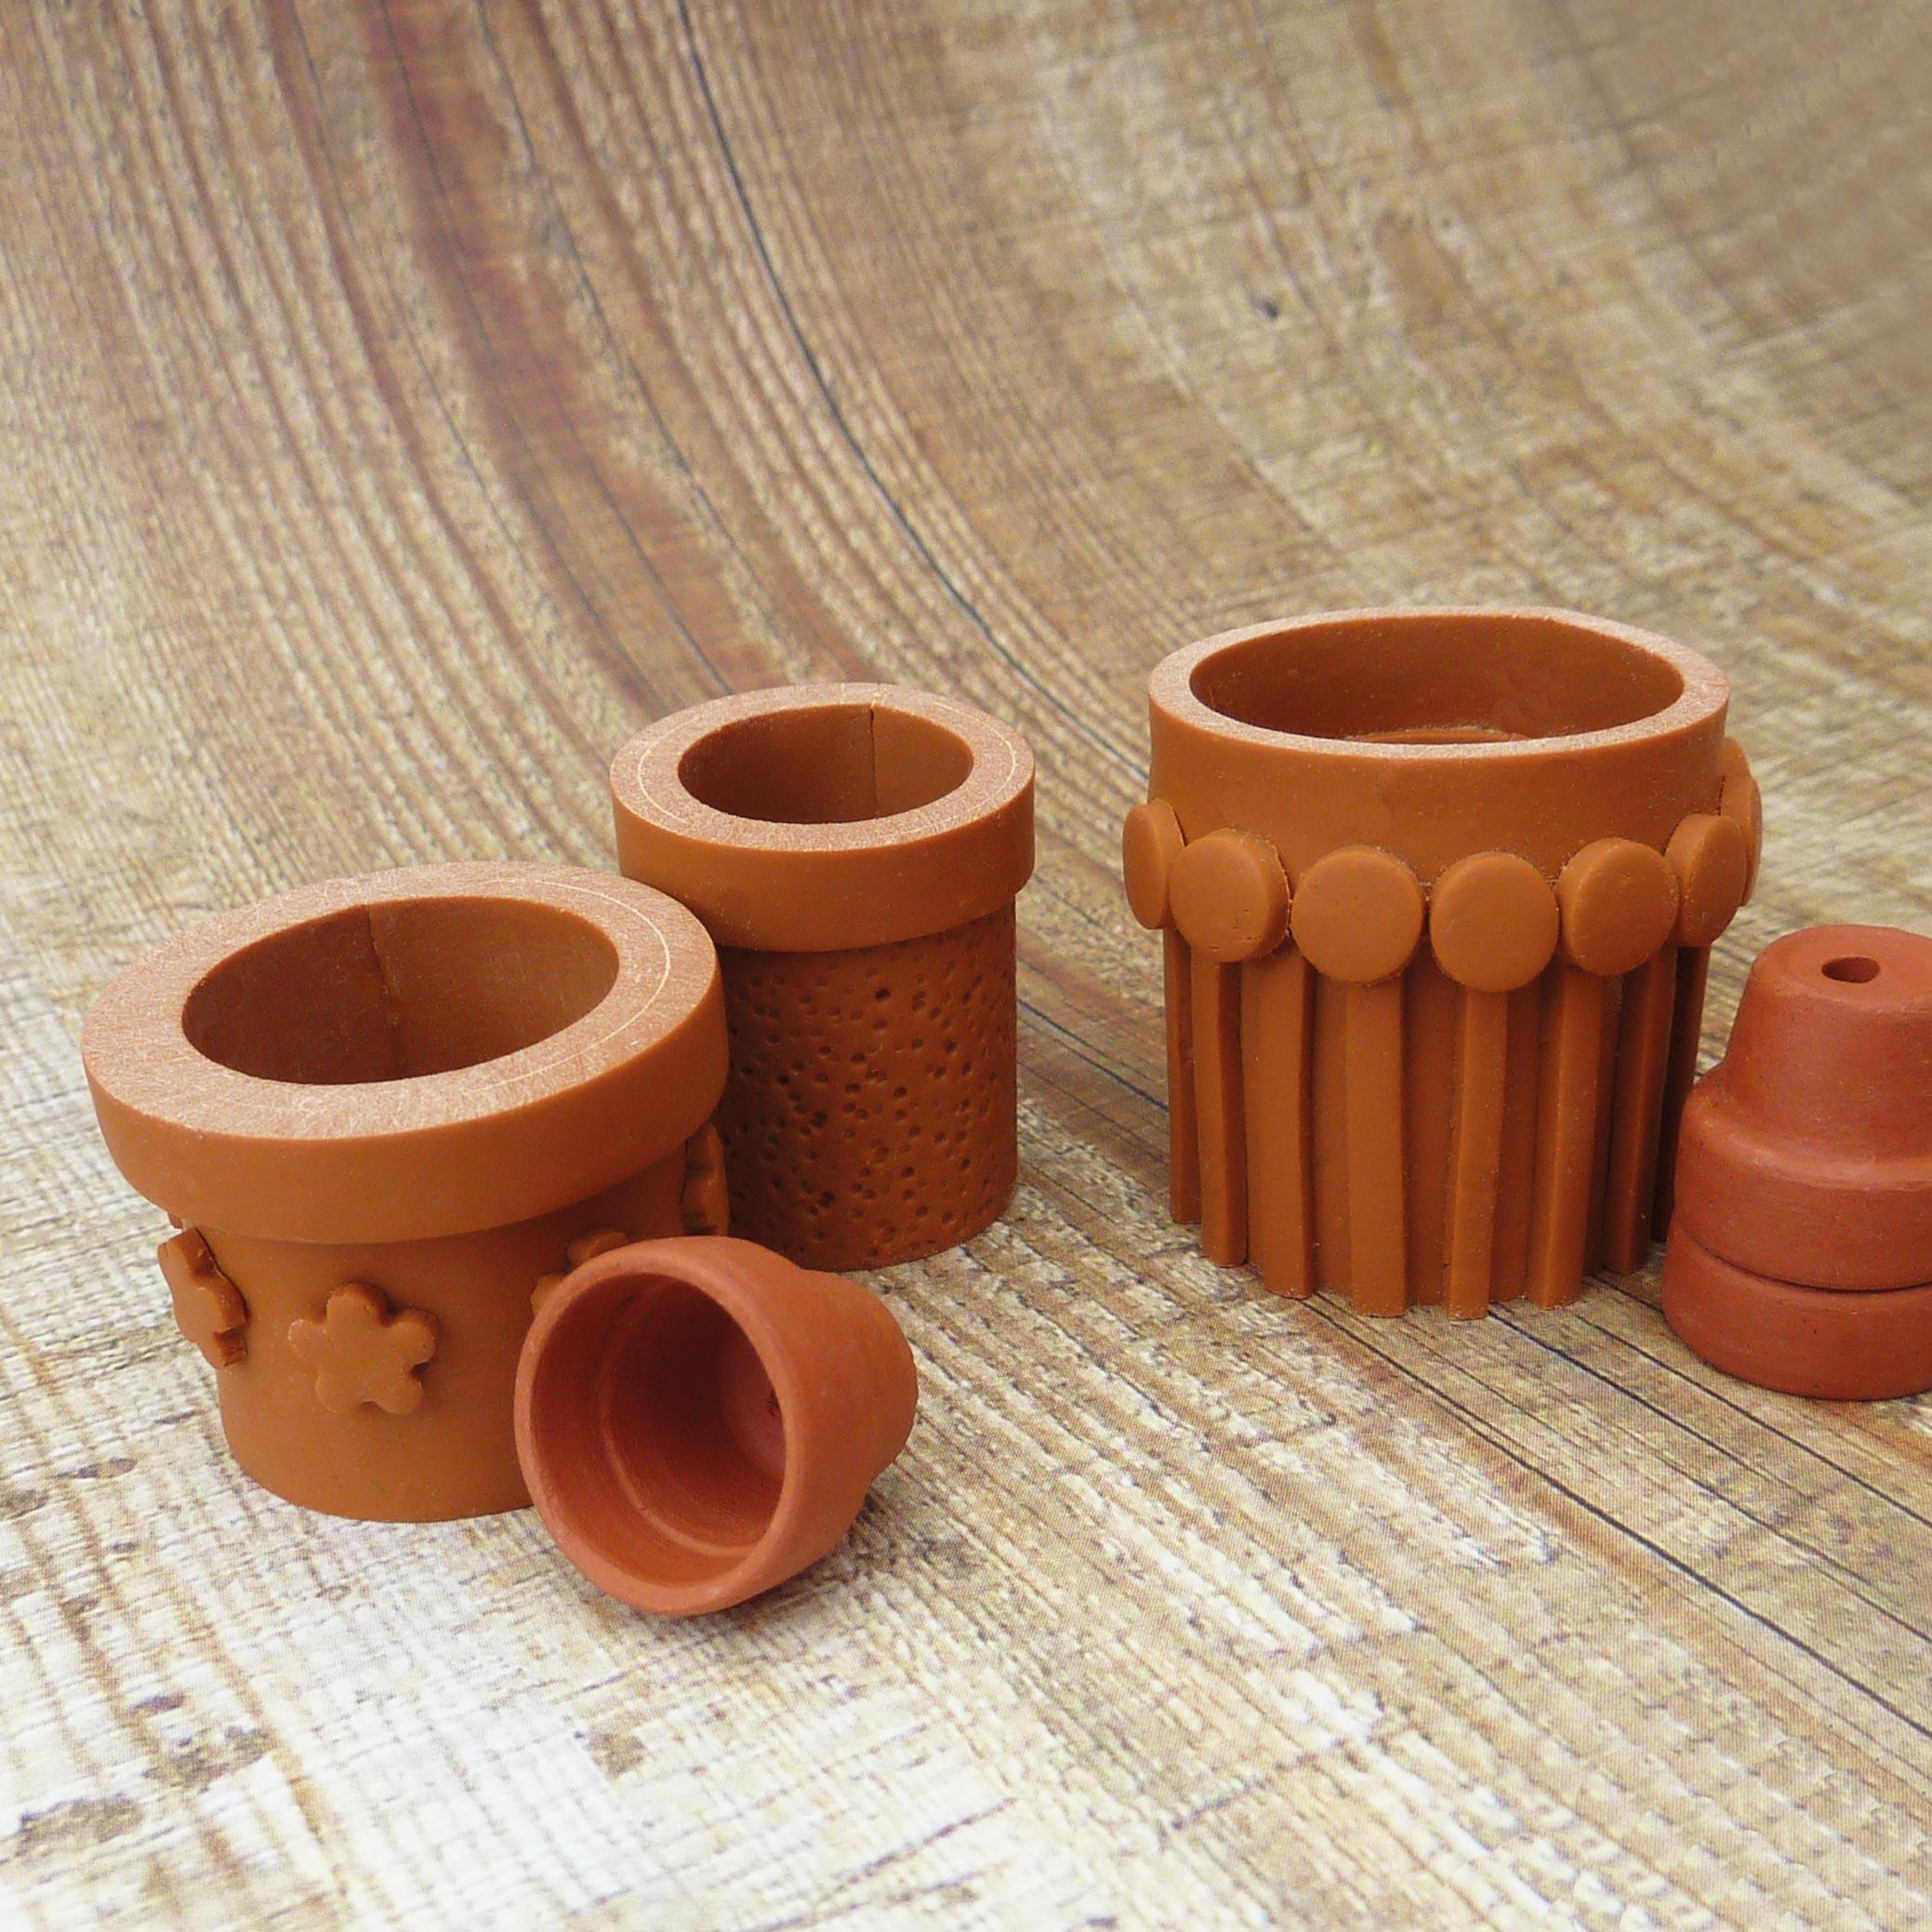 miniature-garden-terracotta-pots